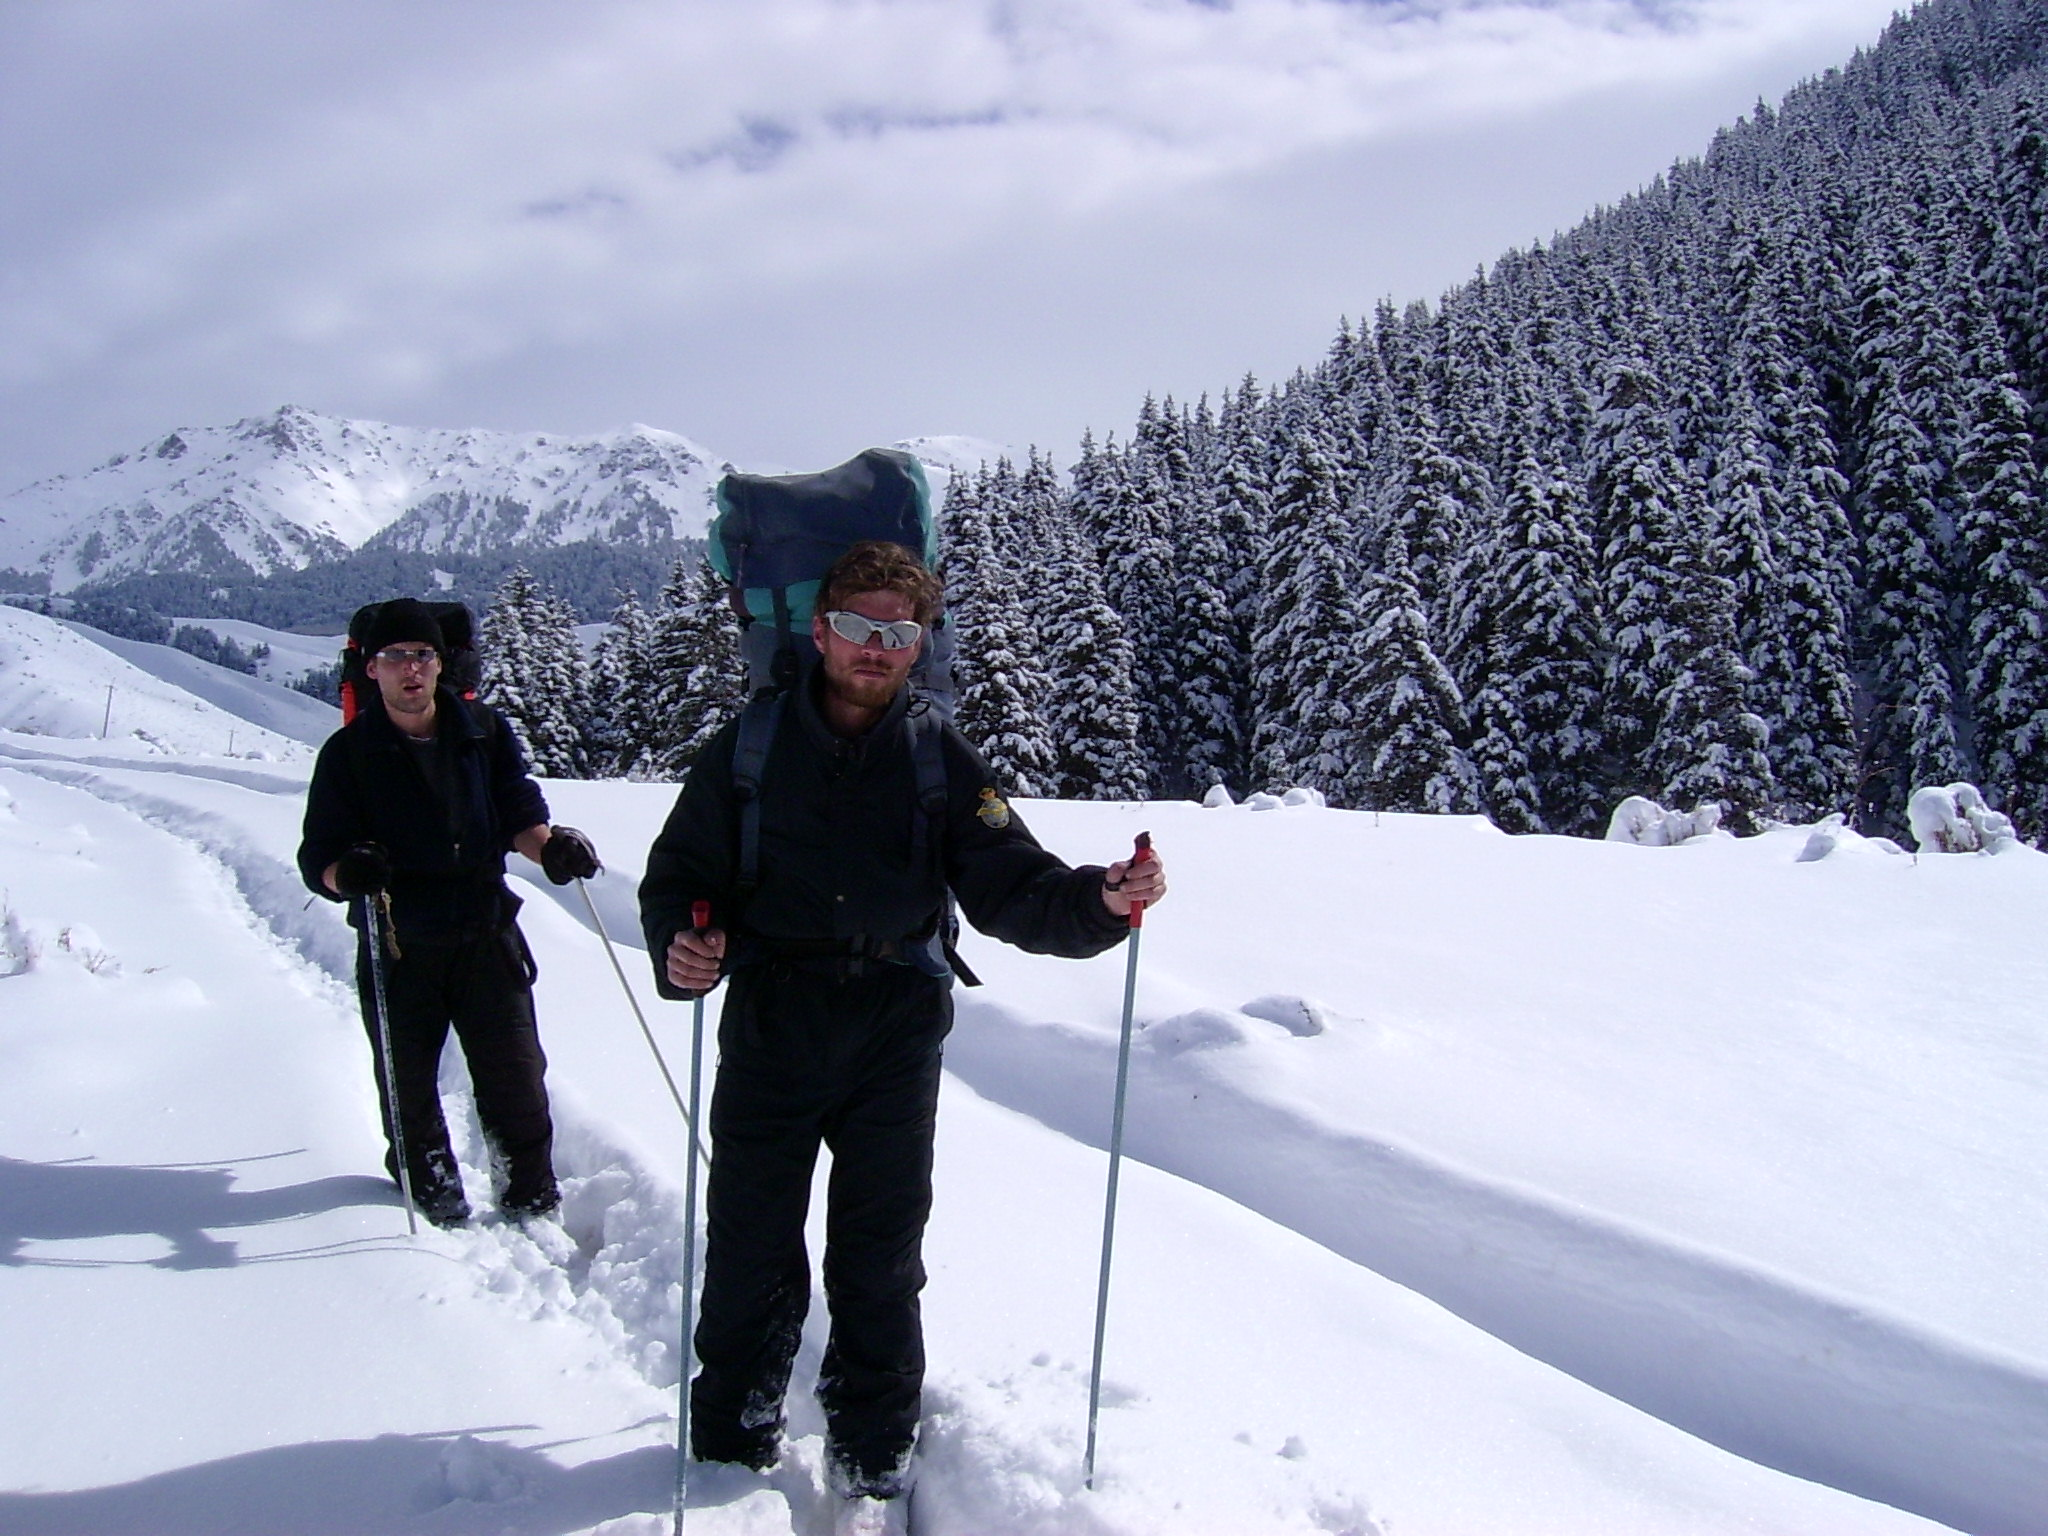 http://turkestan.biz/upload/files/skitour.JPG